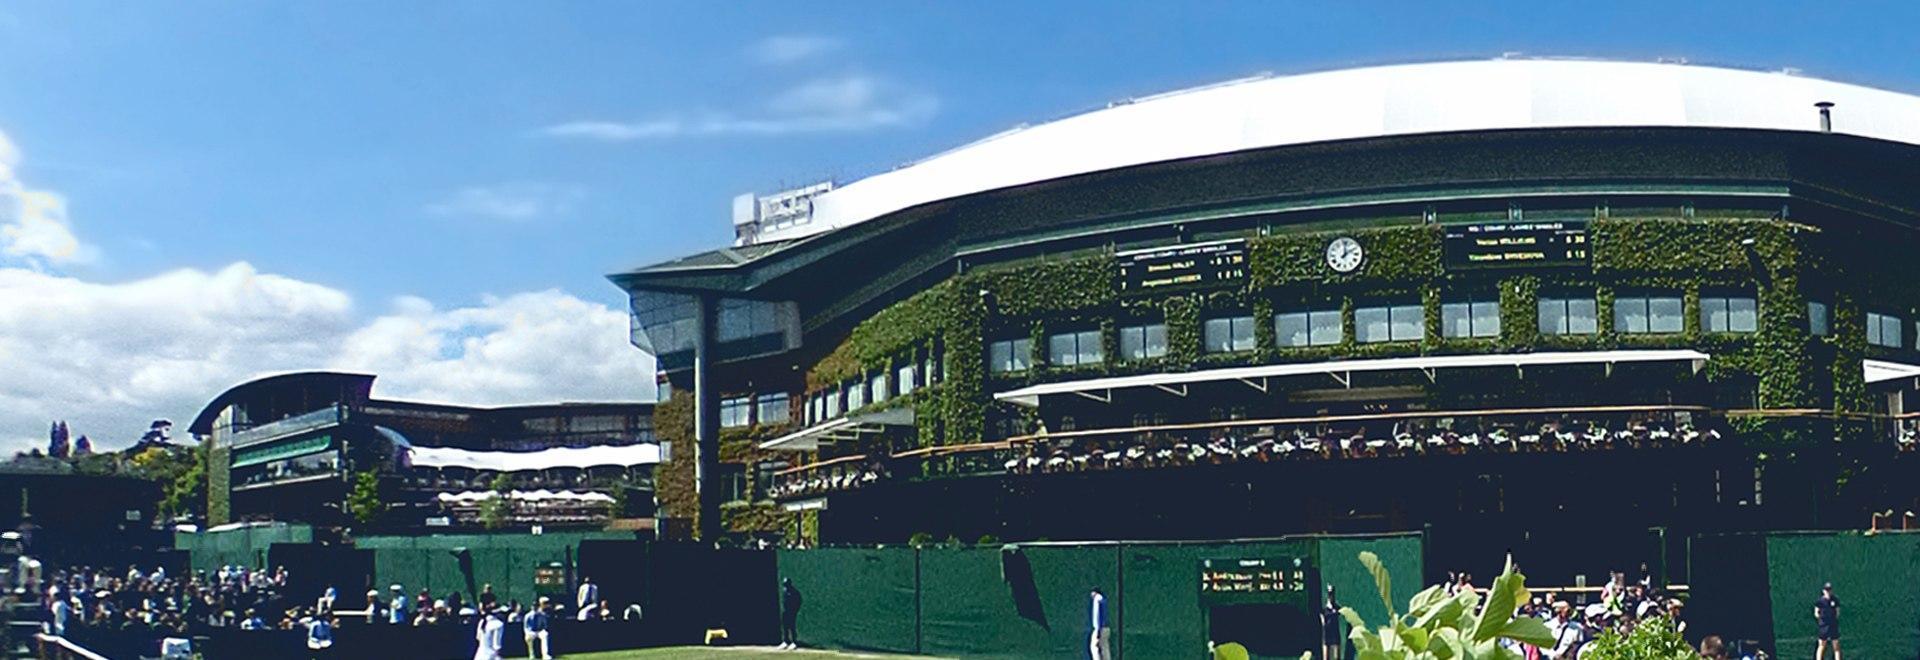 Wimbledon 2019: S. Williams - Halep. Finale